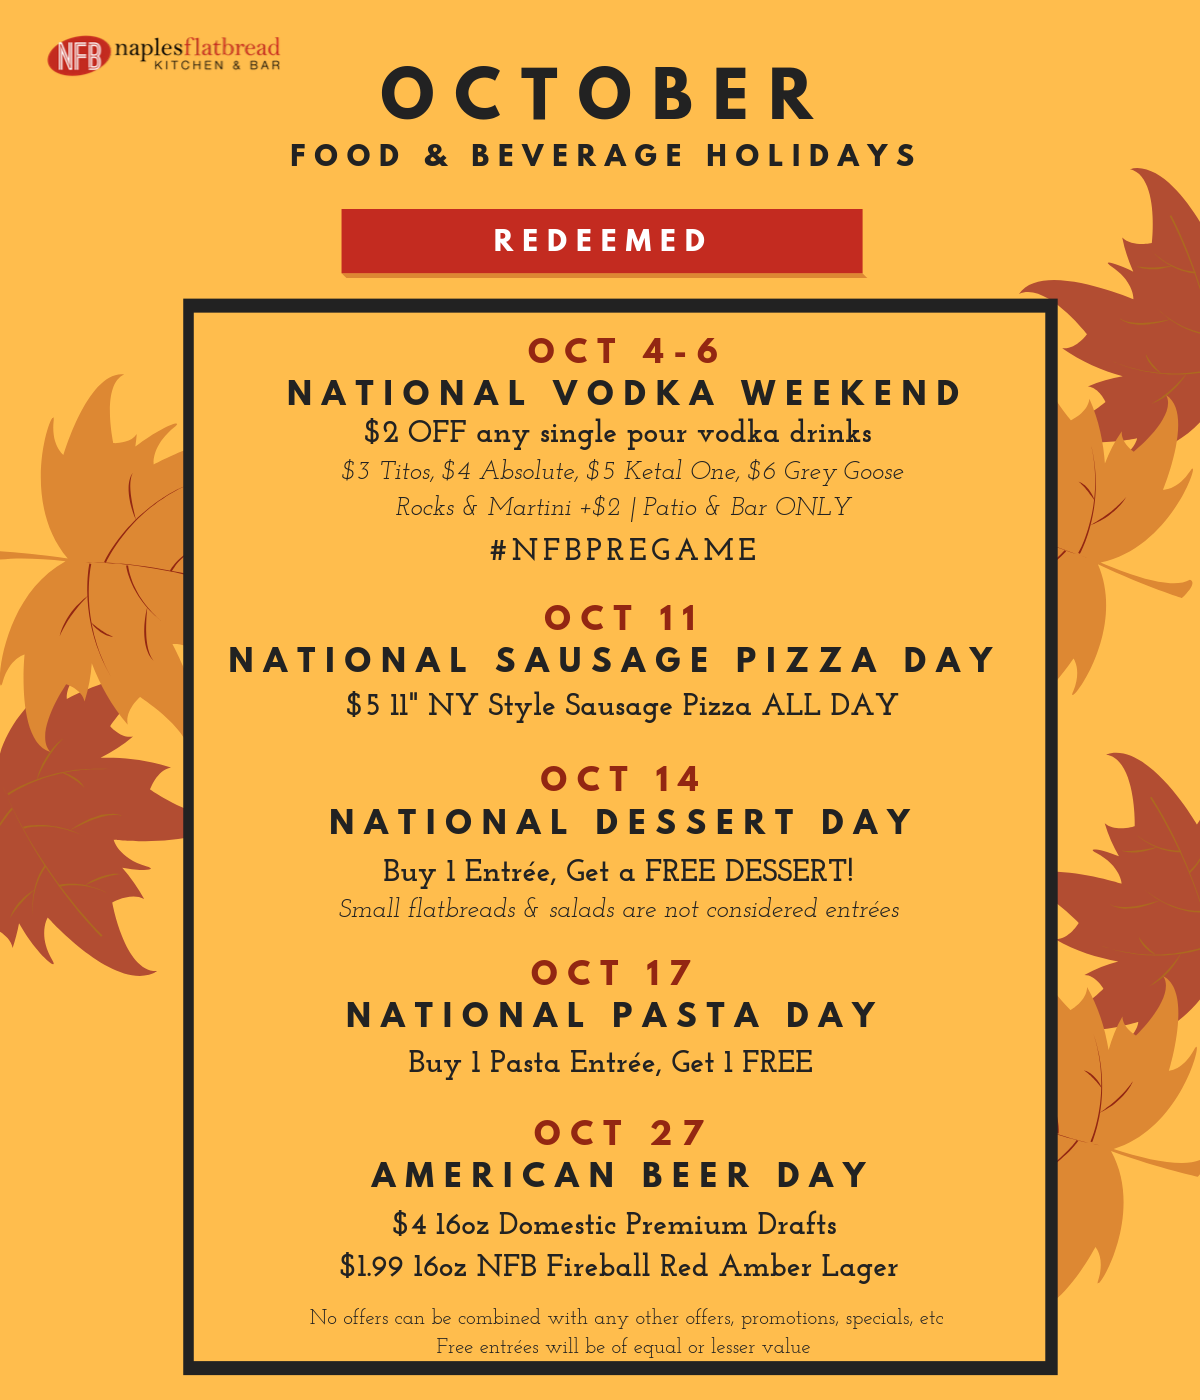 Copy of October Food & Beverage Holiday Redeemed .png